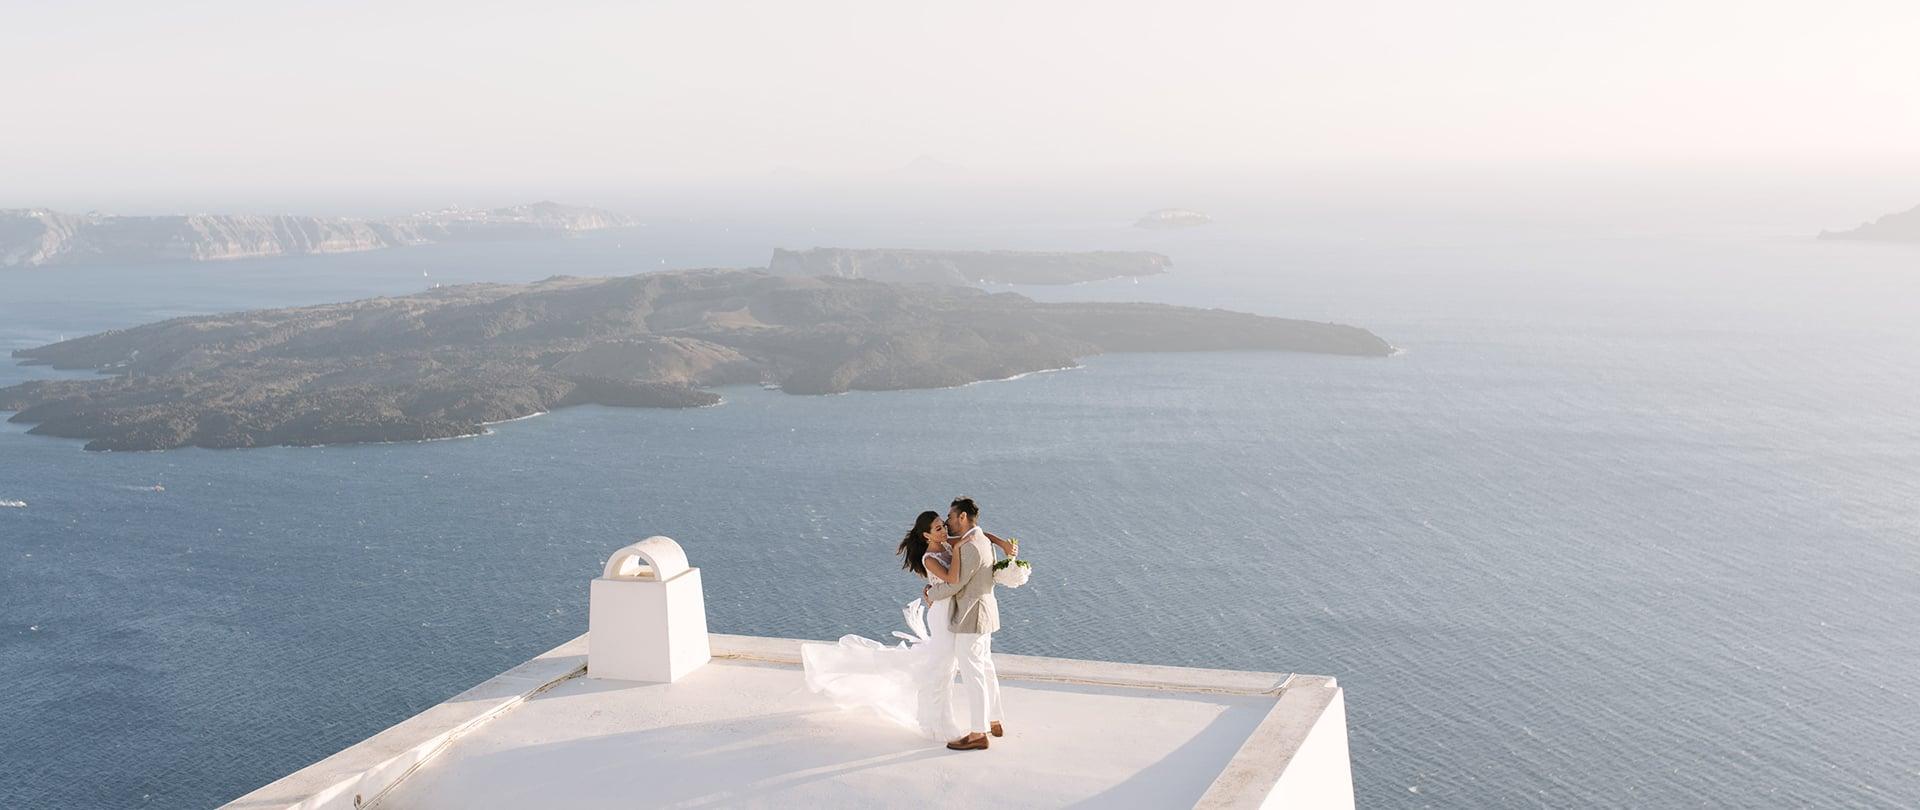 Ashley & Kosta Wedding Video Filmed at Santorini, Greece